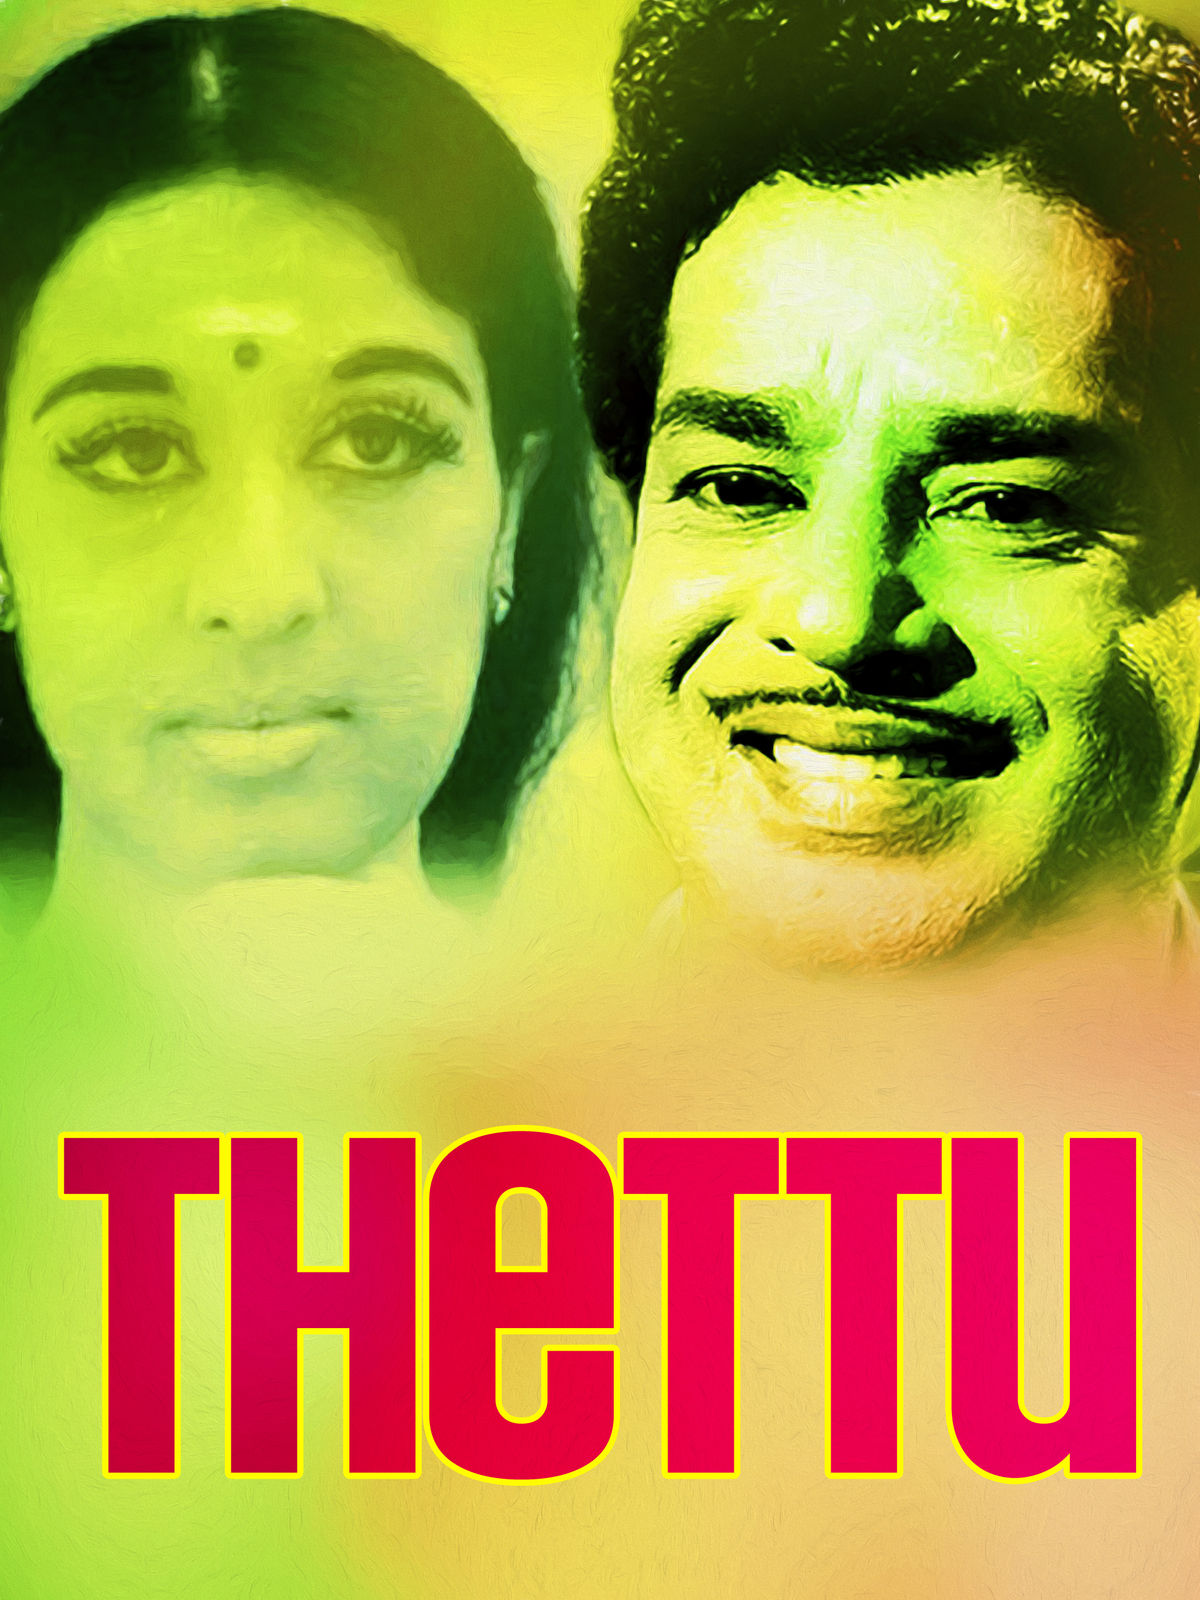 Thettu